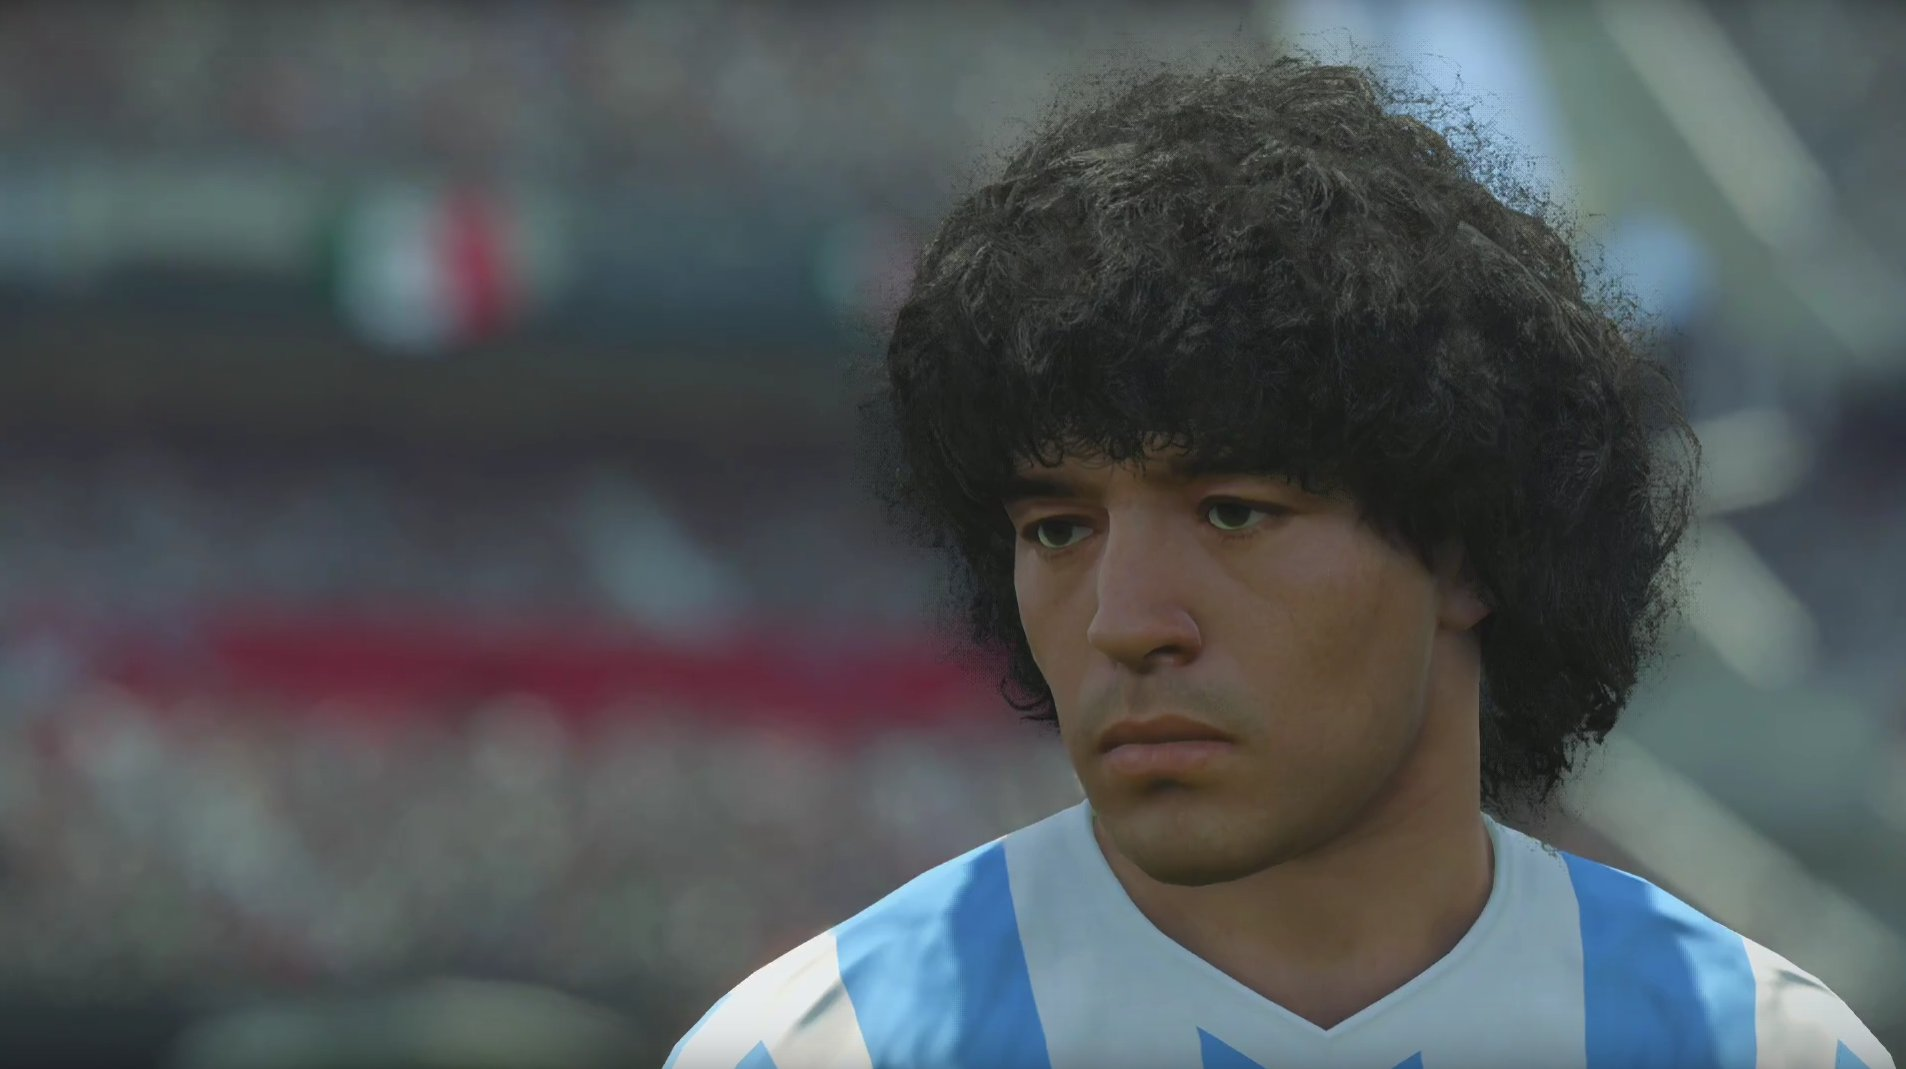 Konami le responde a Maradona tras la amenaza de demanda